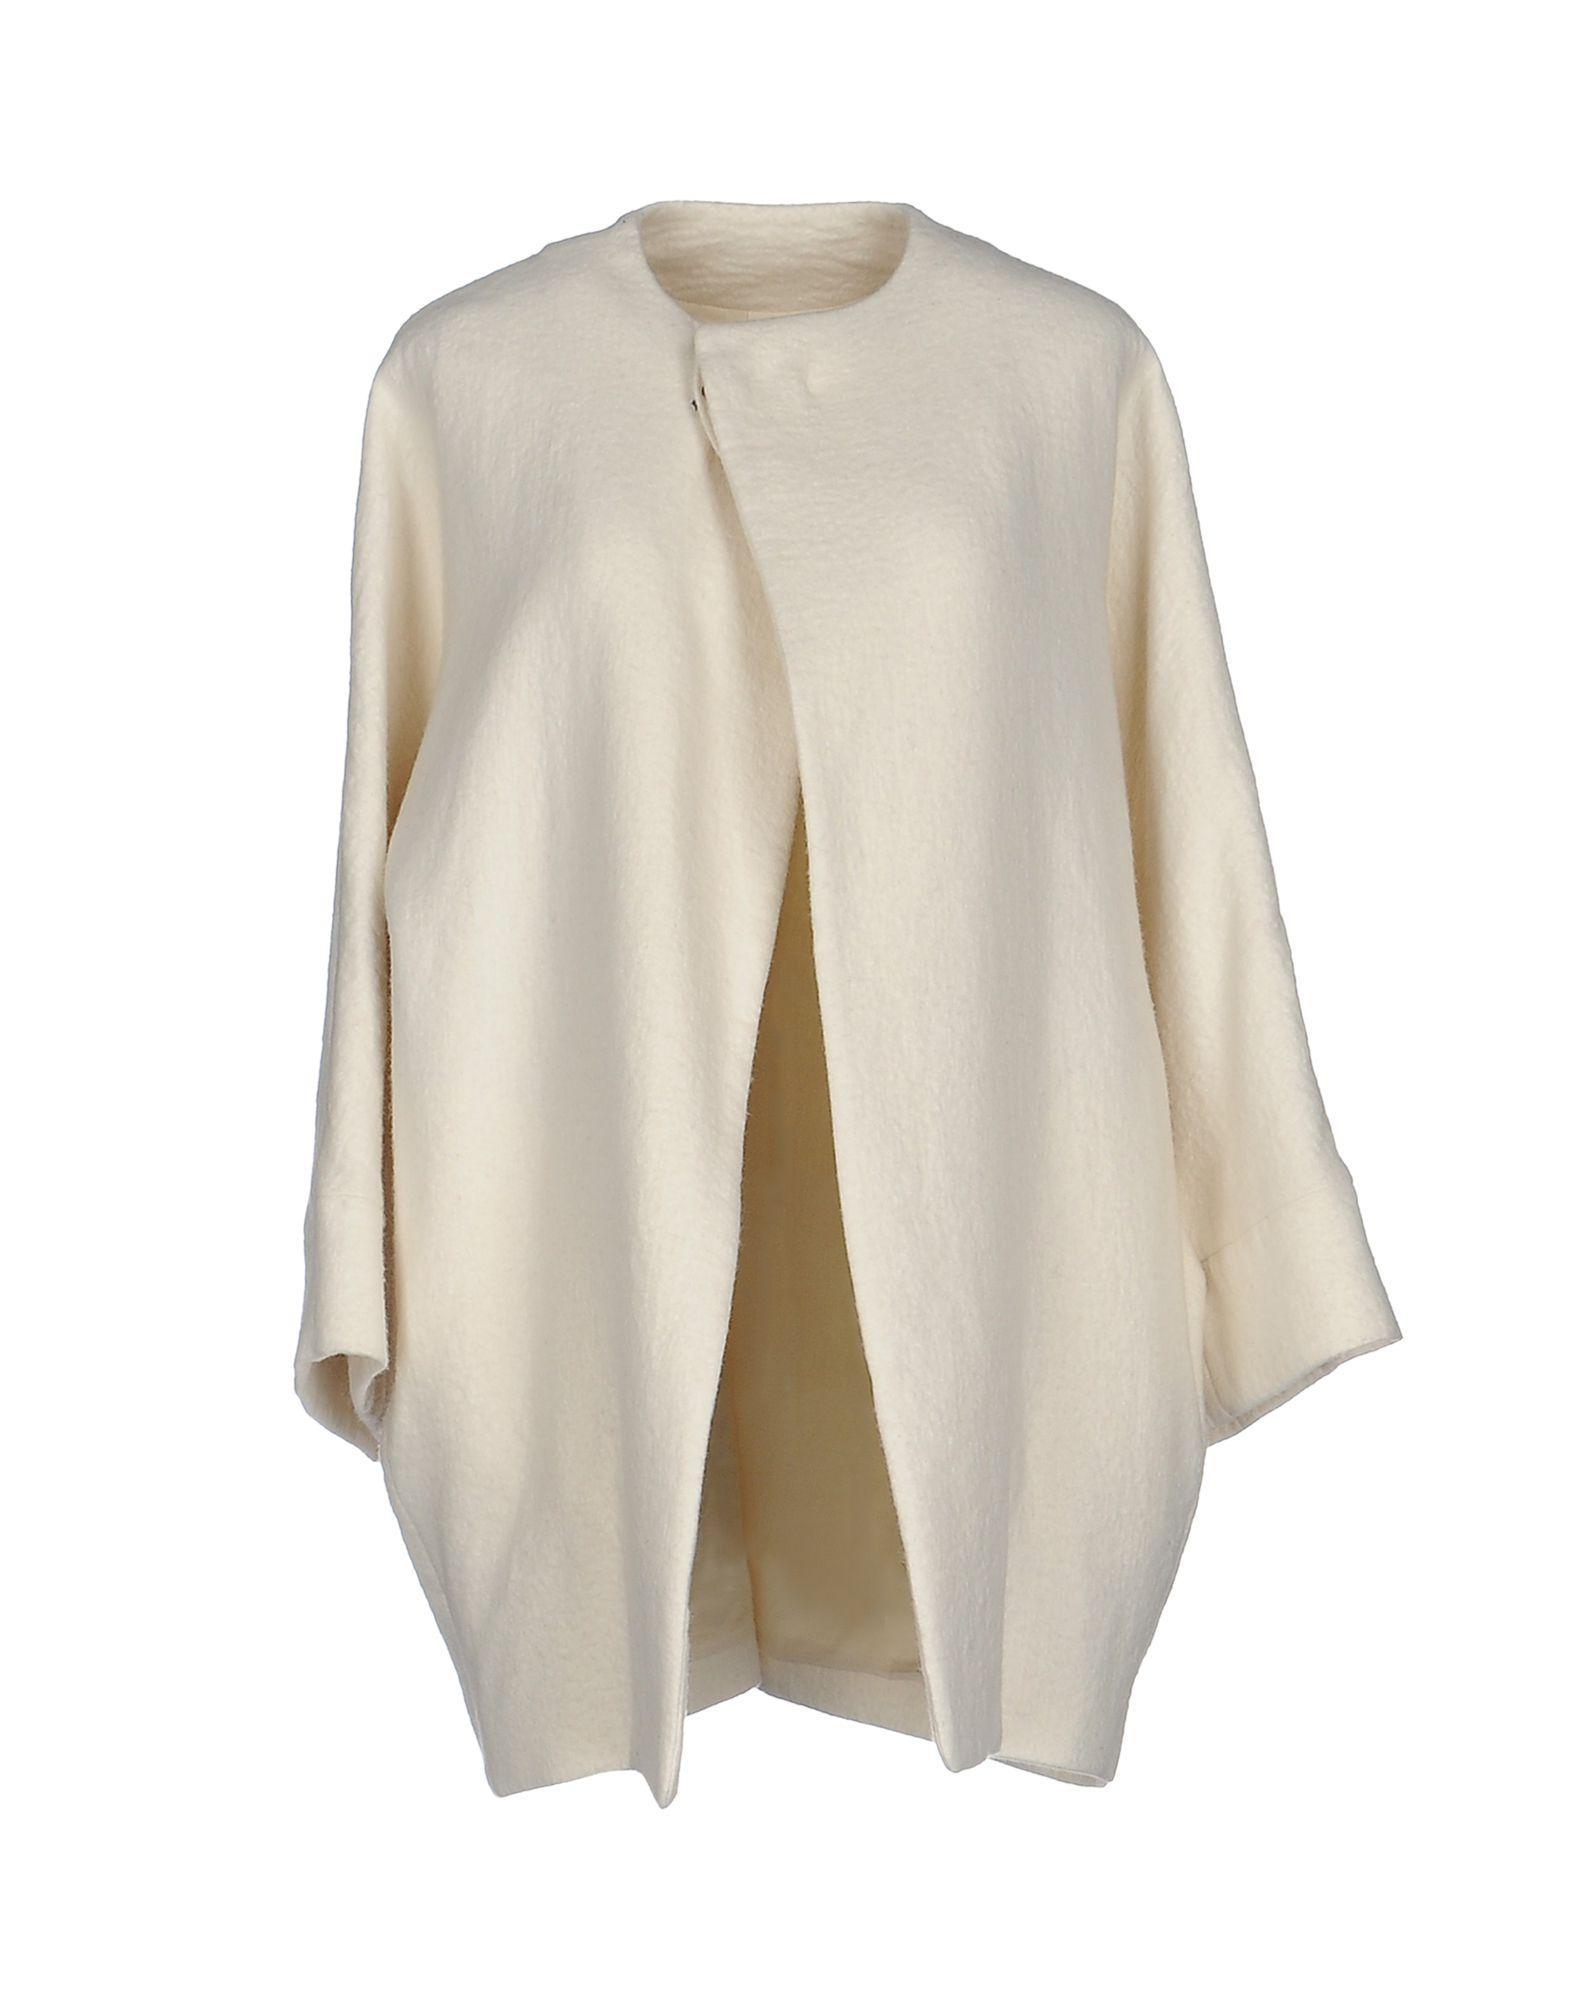 08sircus Coat In Ivory